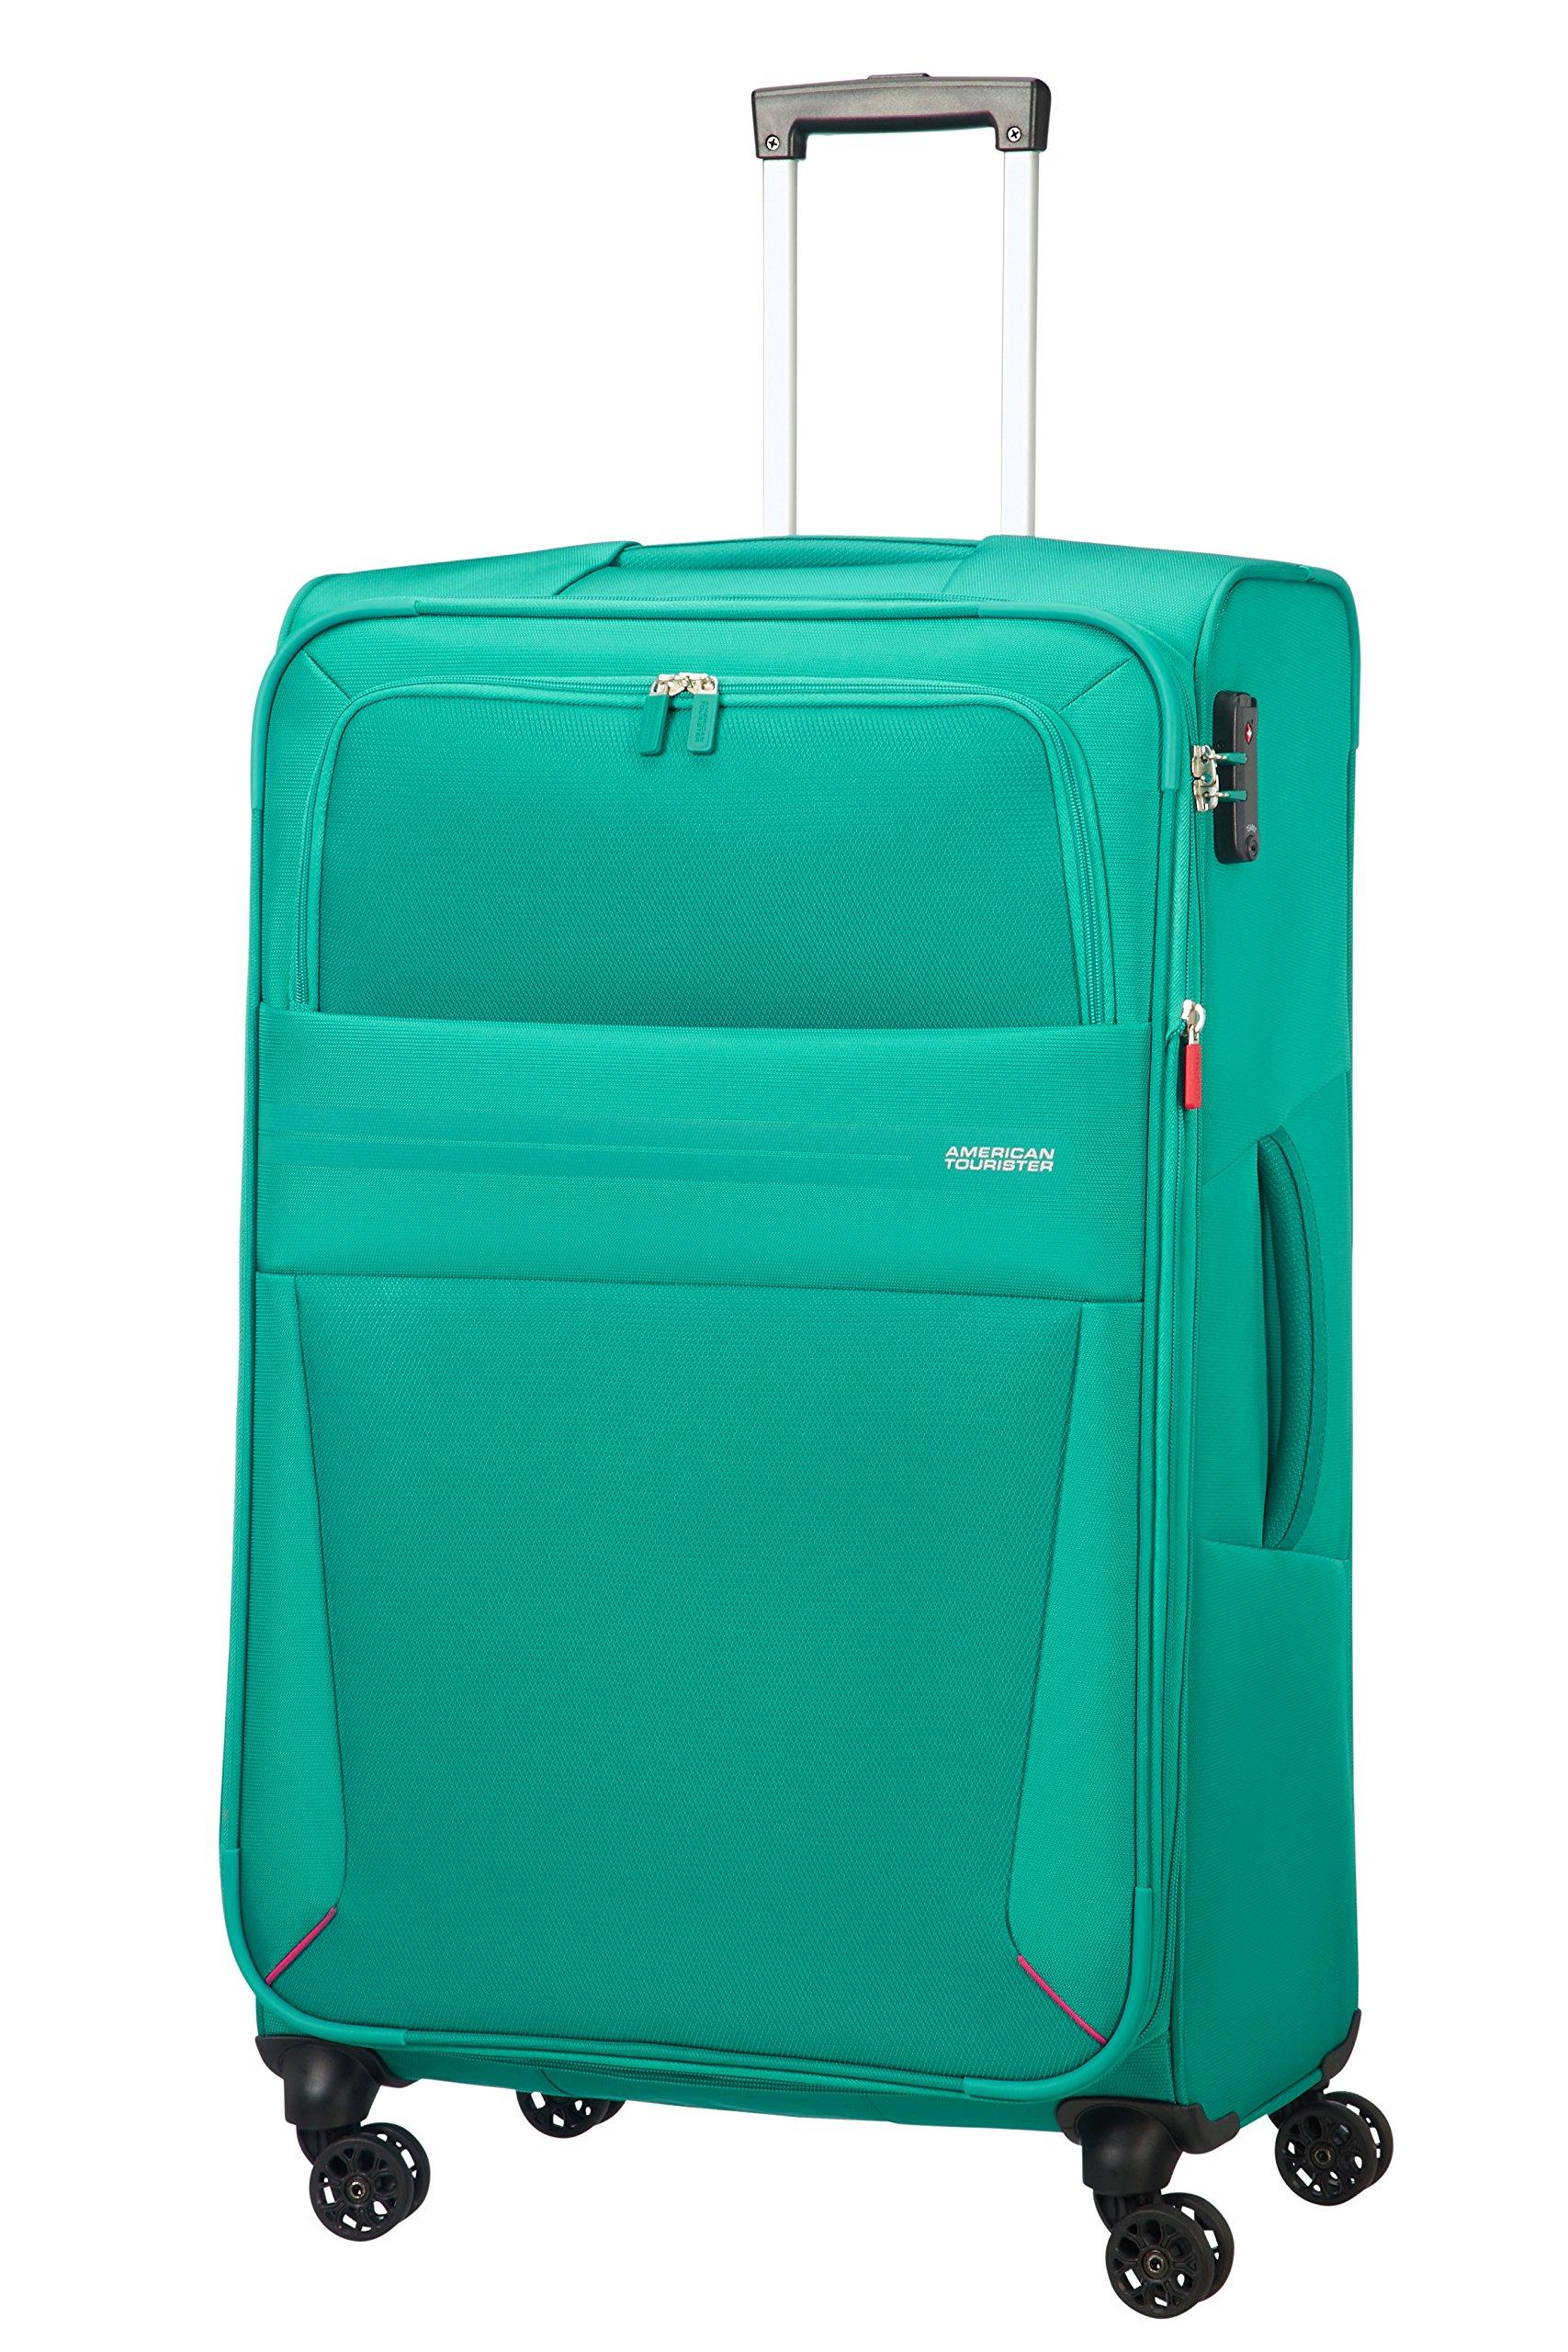 American-Tourister-Summer-Voyager-Spinner-Erweiterbar-39-kg-Koffer-79-cm-123-Liter-Peacock-Green